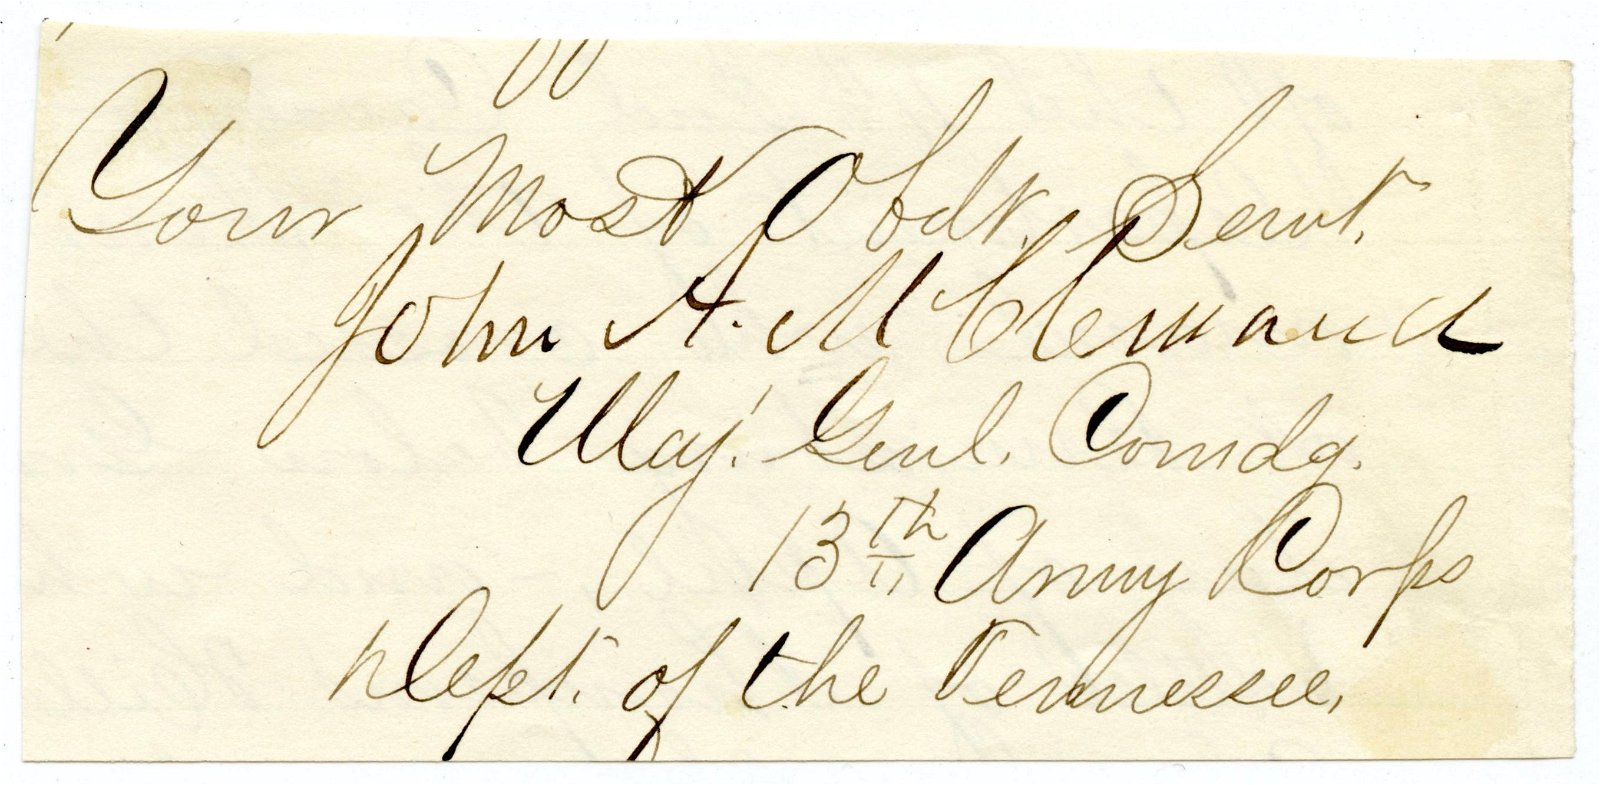 Civil War Signature of General McClernand